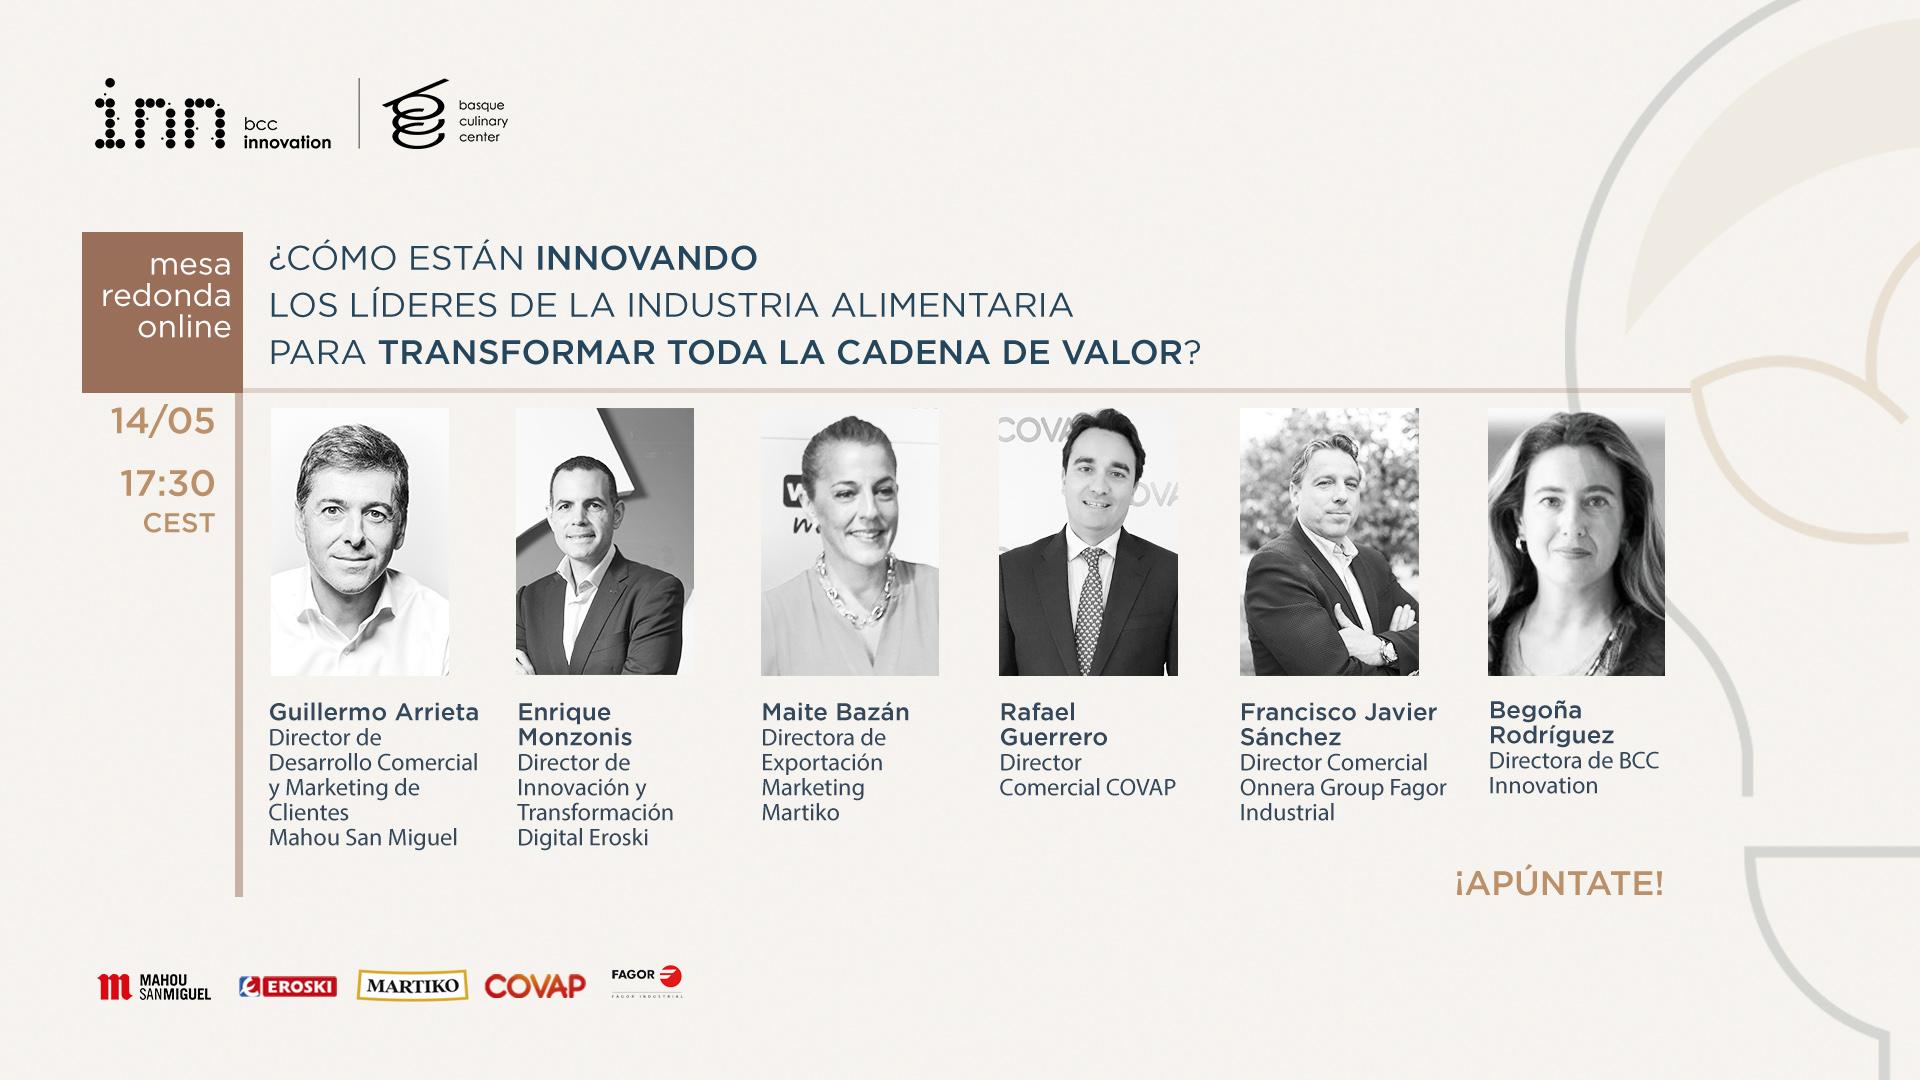 Mesa redonda online post-covid con Eroski, Mahou San Miguel, Martiko, Covap y Onnera Group